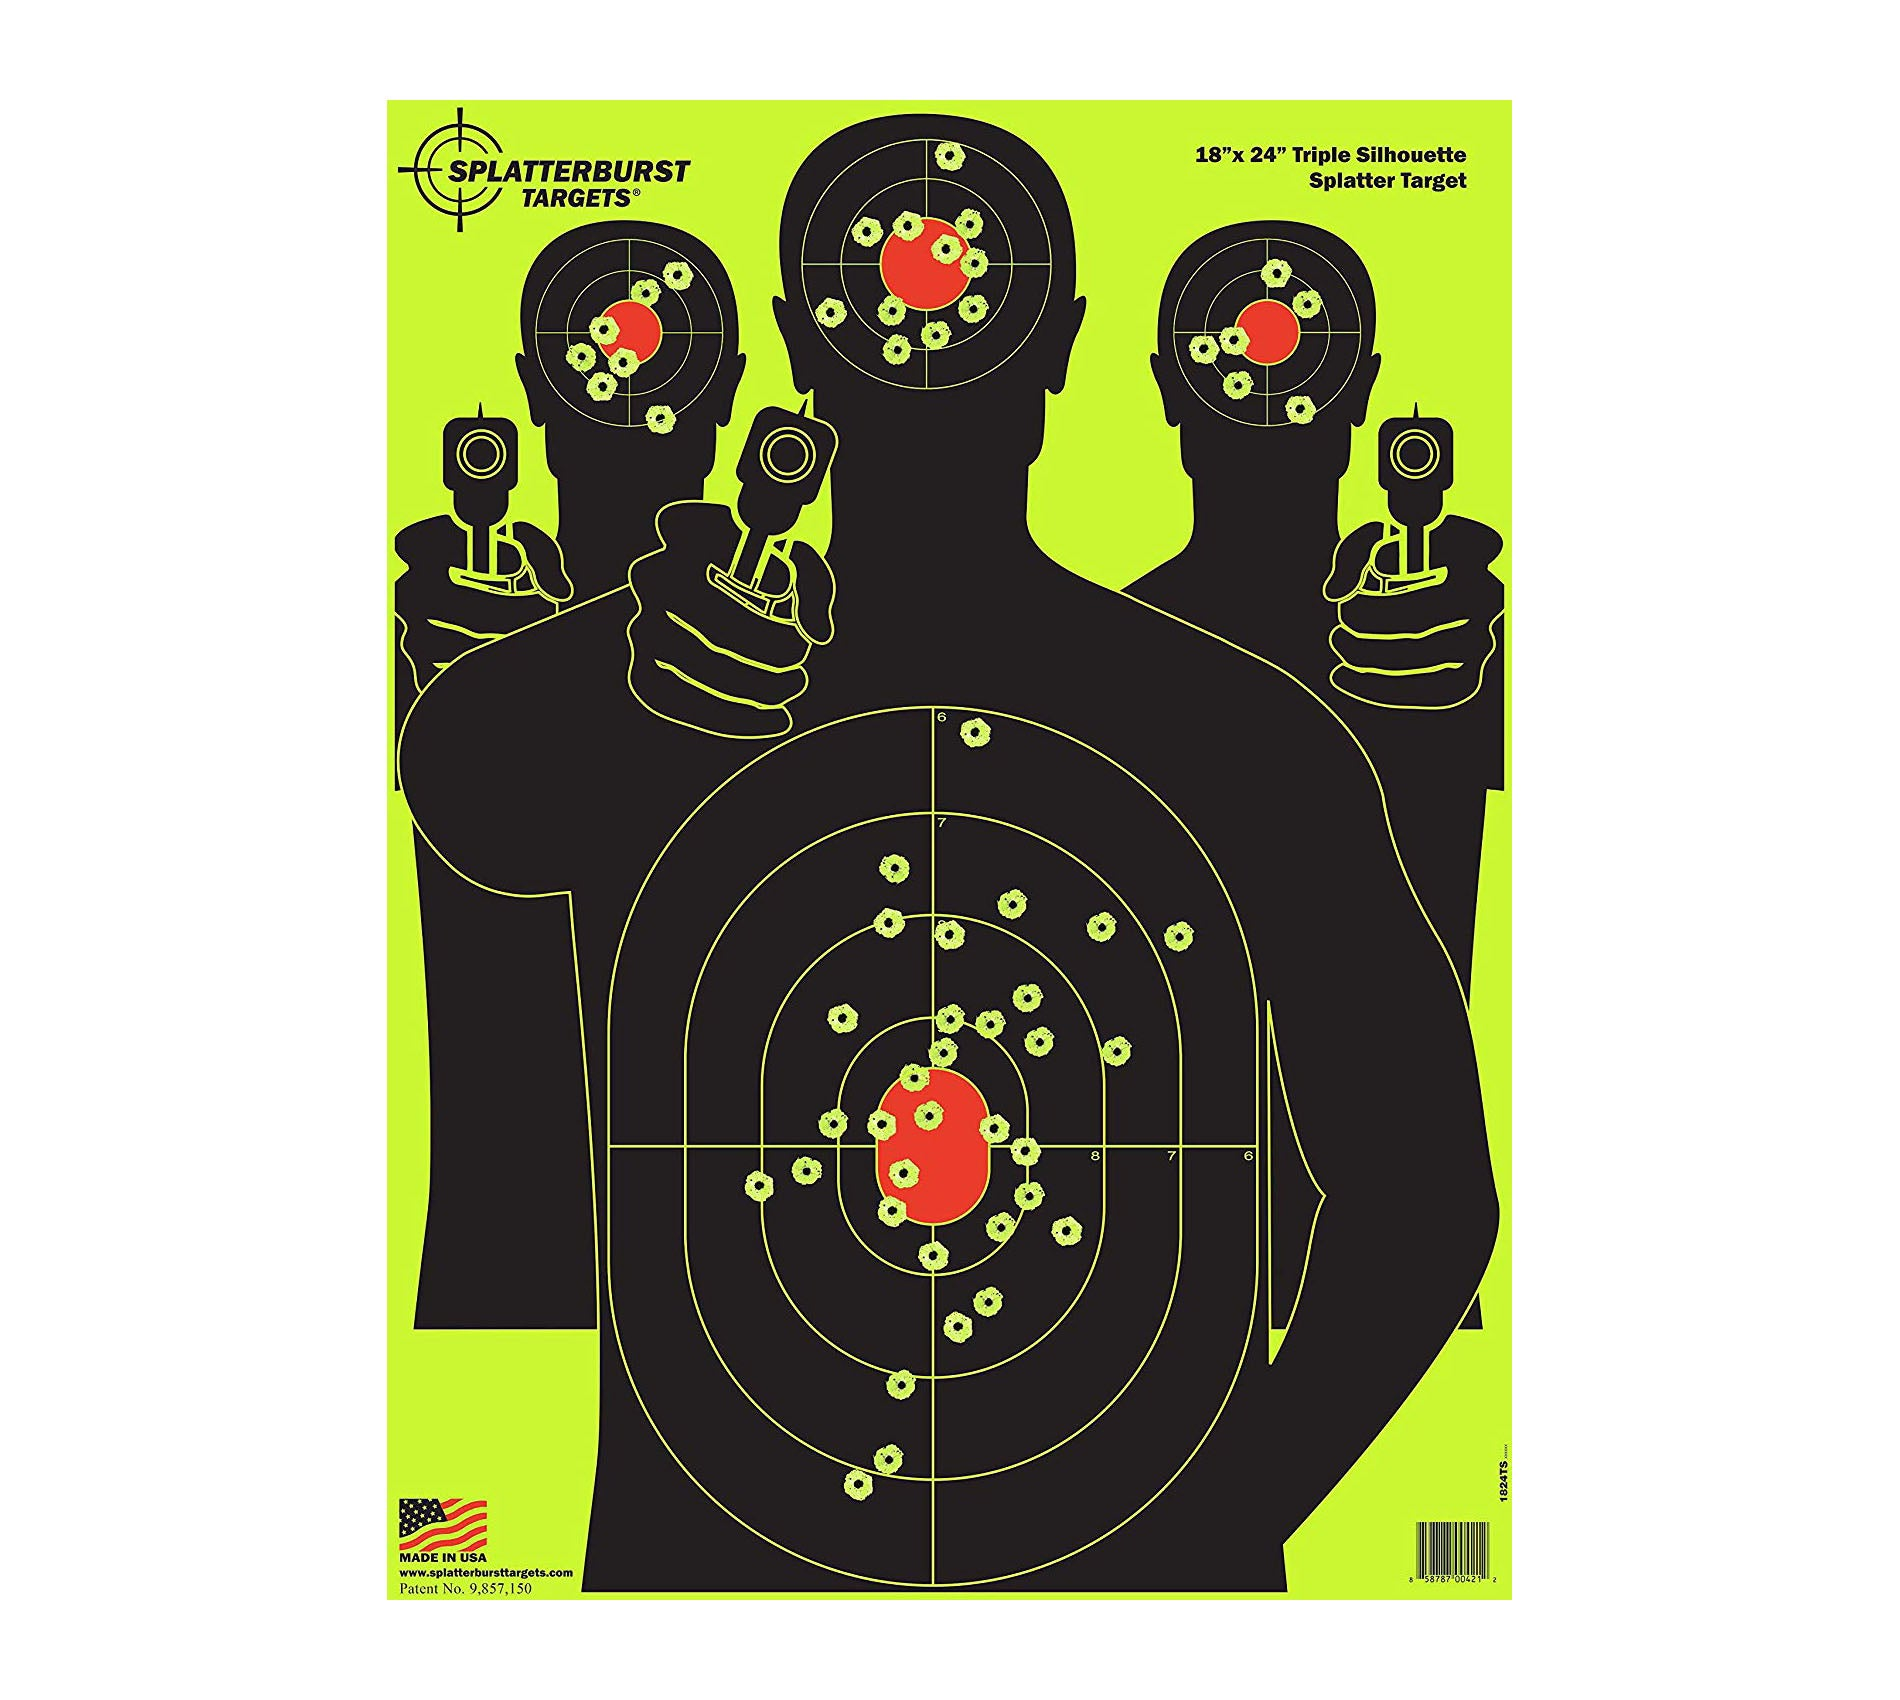 Splatterburst Targets - 18 x 24 inch